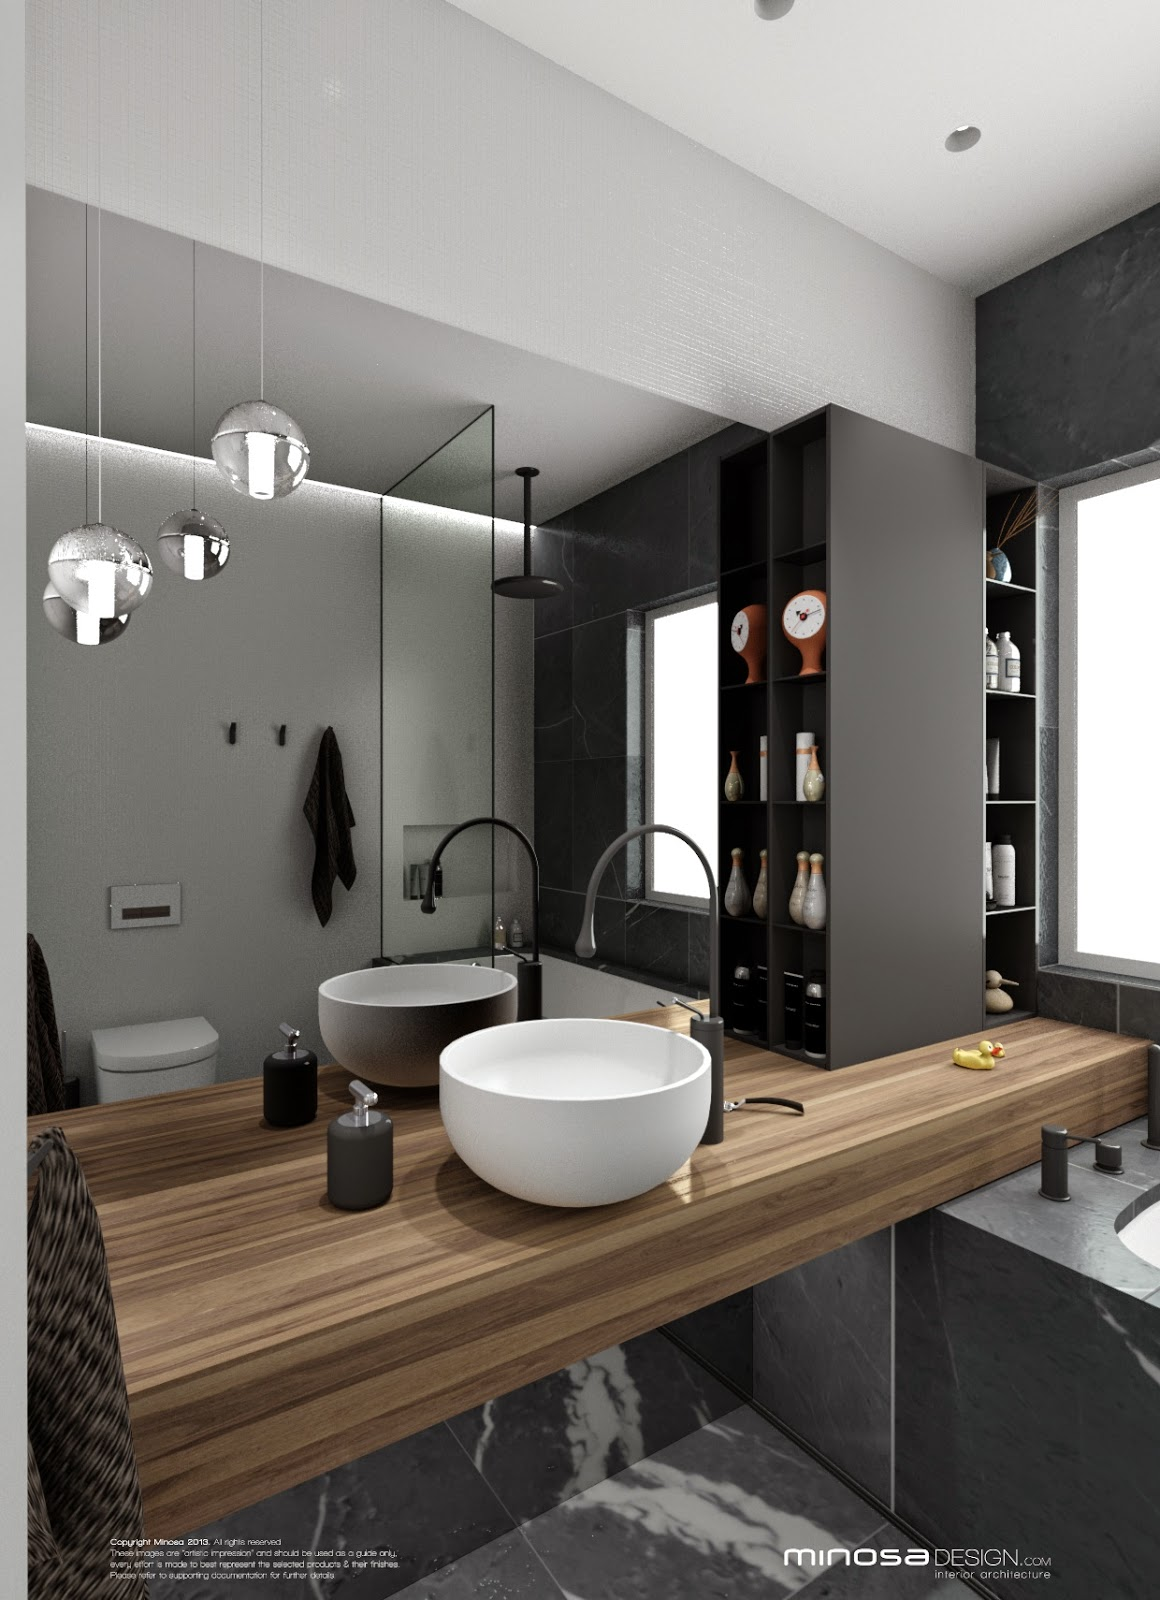 Minosa Bathroom Design  Small Space Feels Large